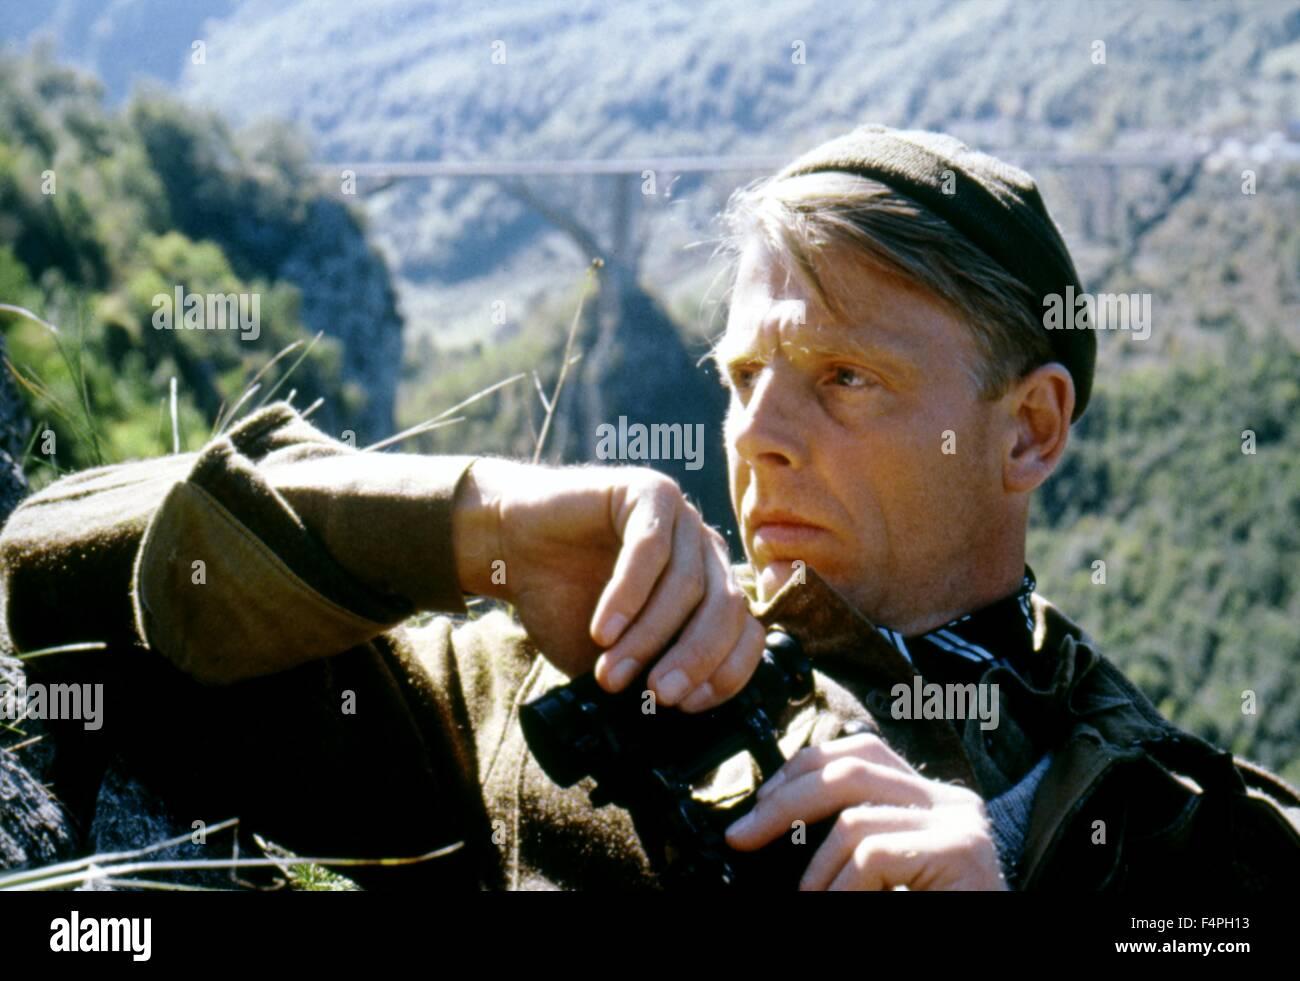 Edward Fox / Force 10 from Navarone / 1978 directed by Guy Hamilton - Stock Image